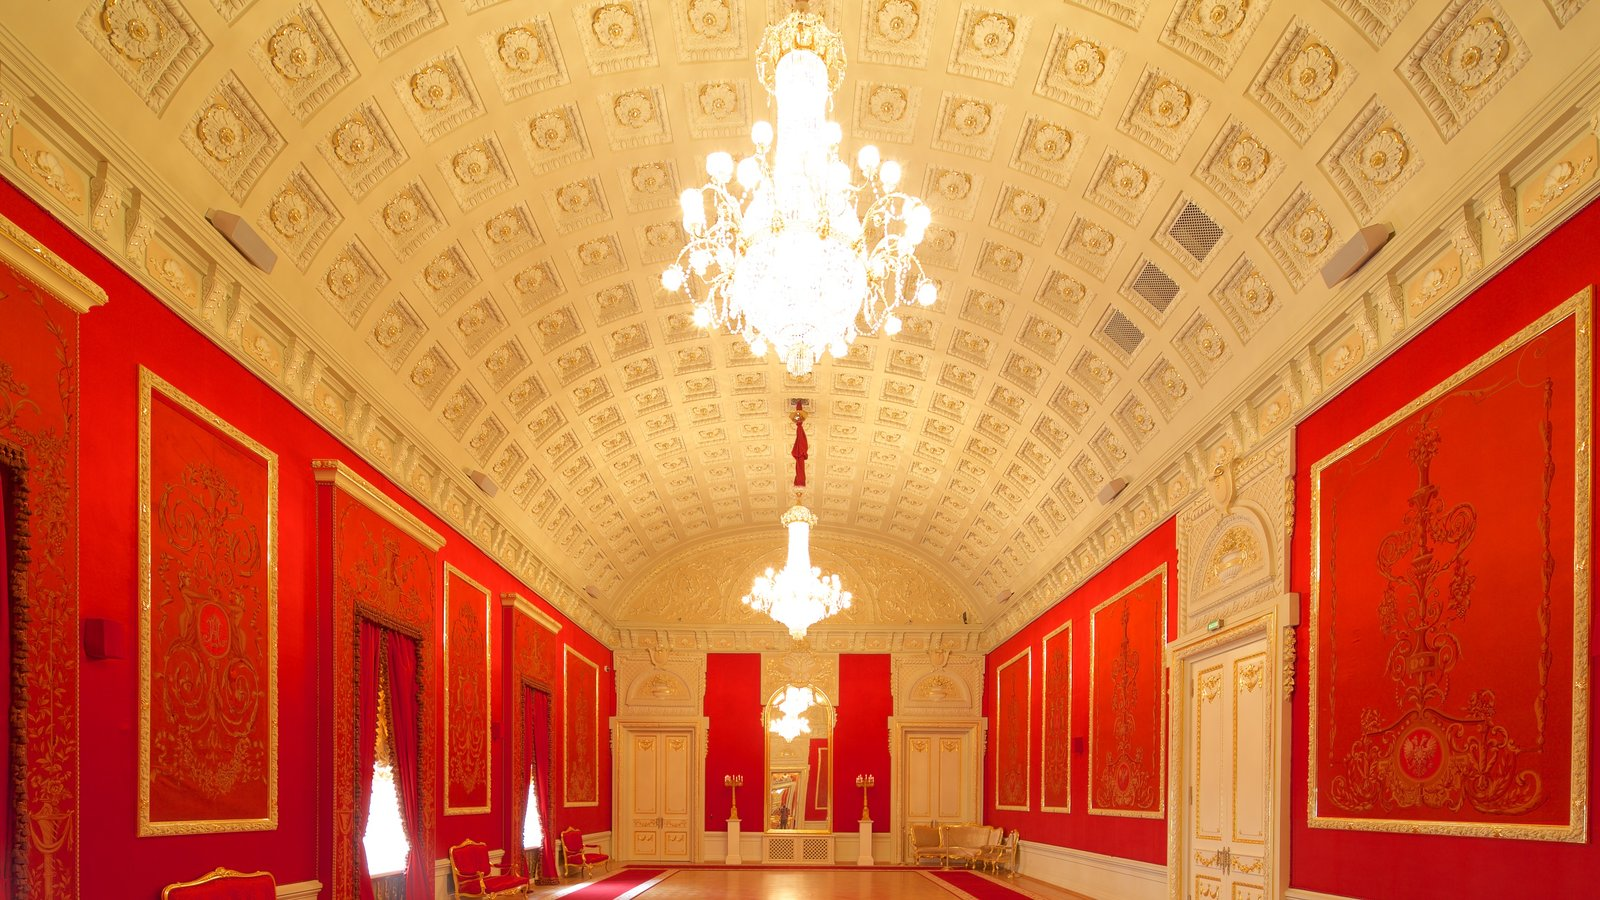 Teatro Bolshoi mostrando arquitetura de patrimônio e vistas internas